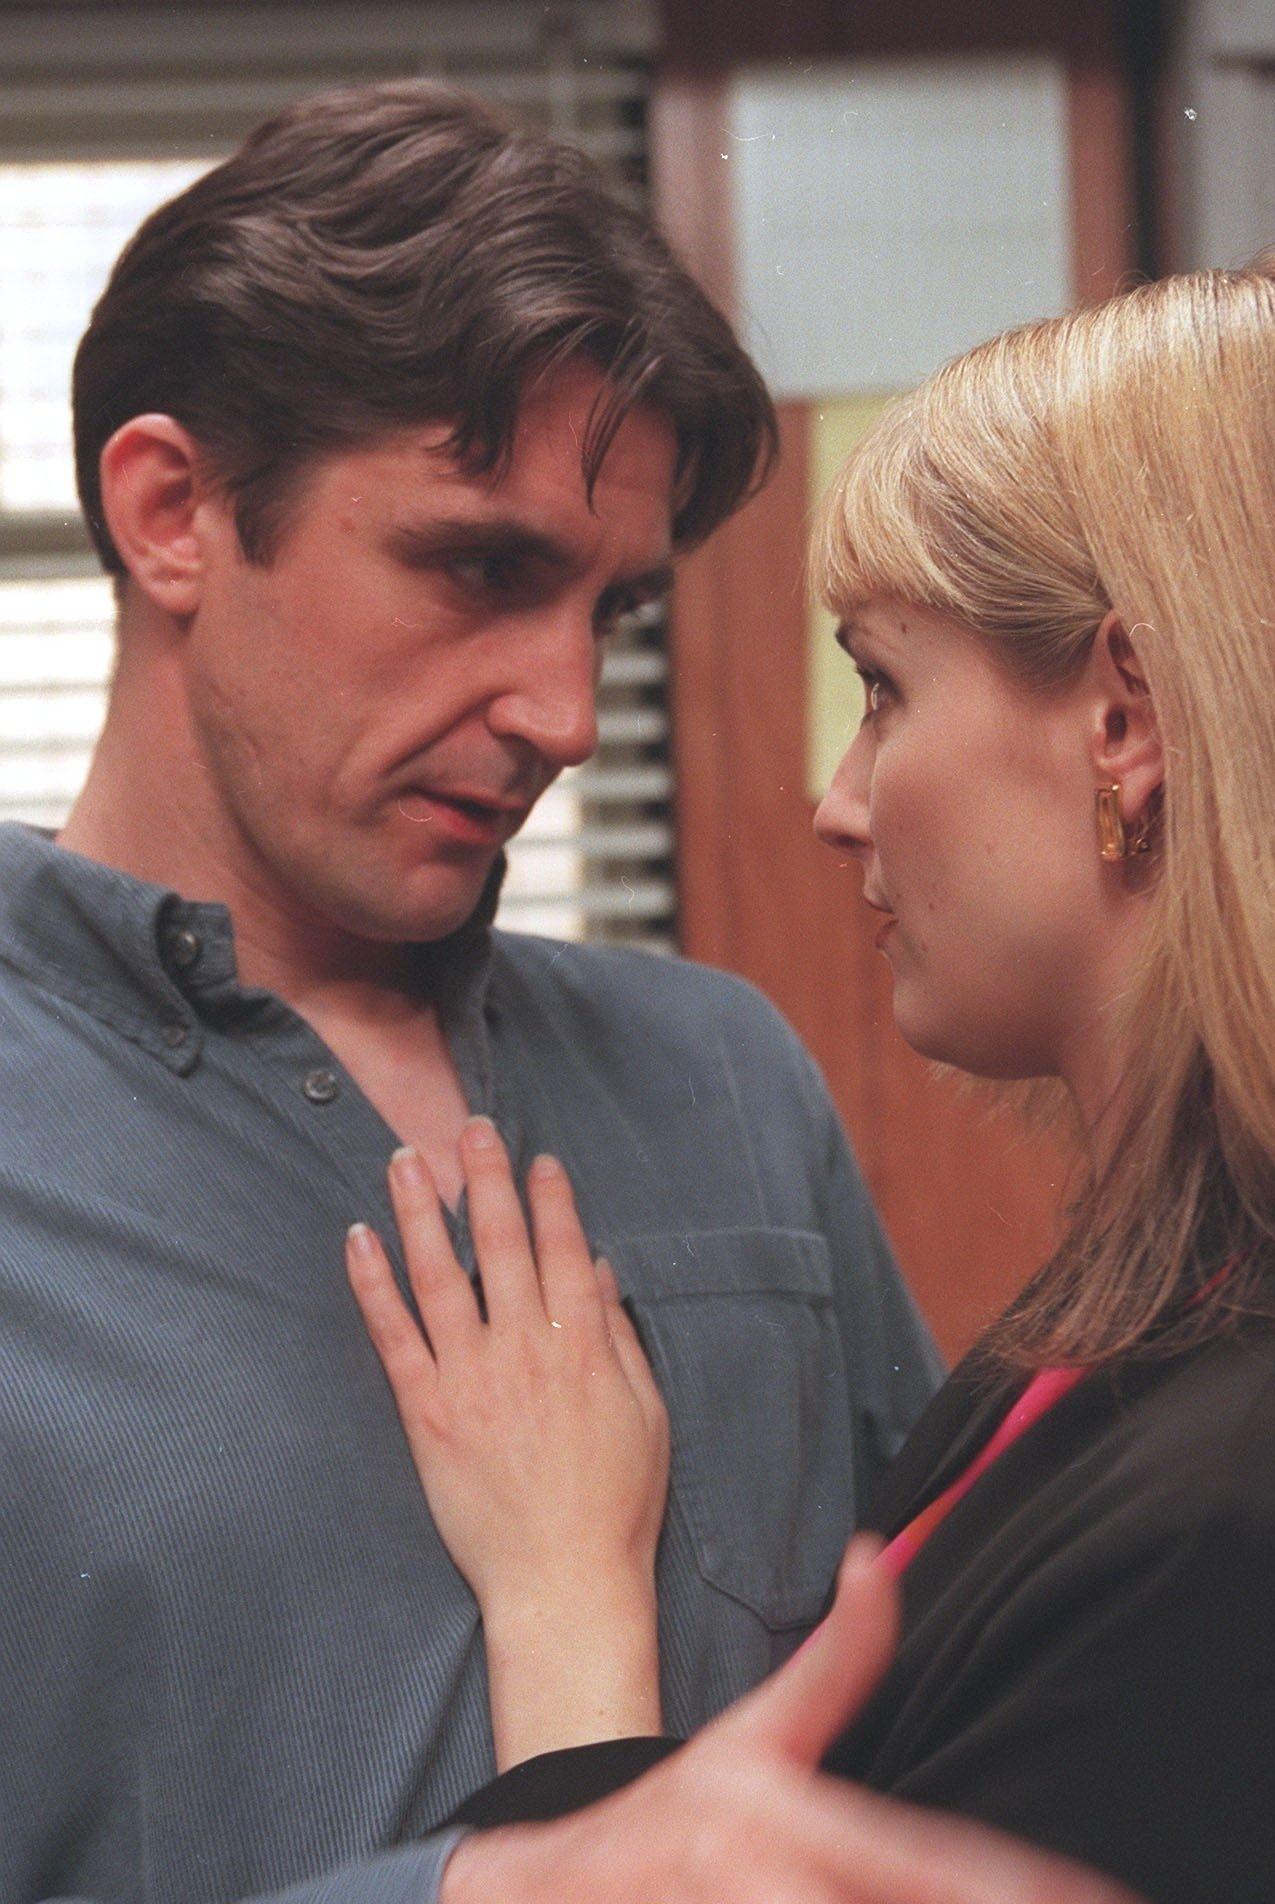 Stephen in Emmerdale as Sean Reynolds having an affair with Tara Thornfield